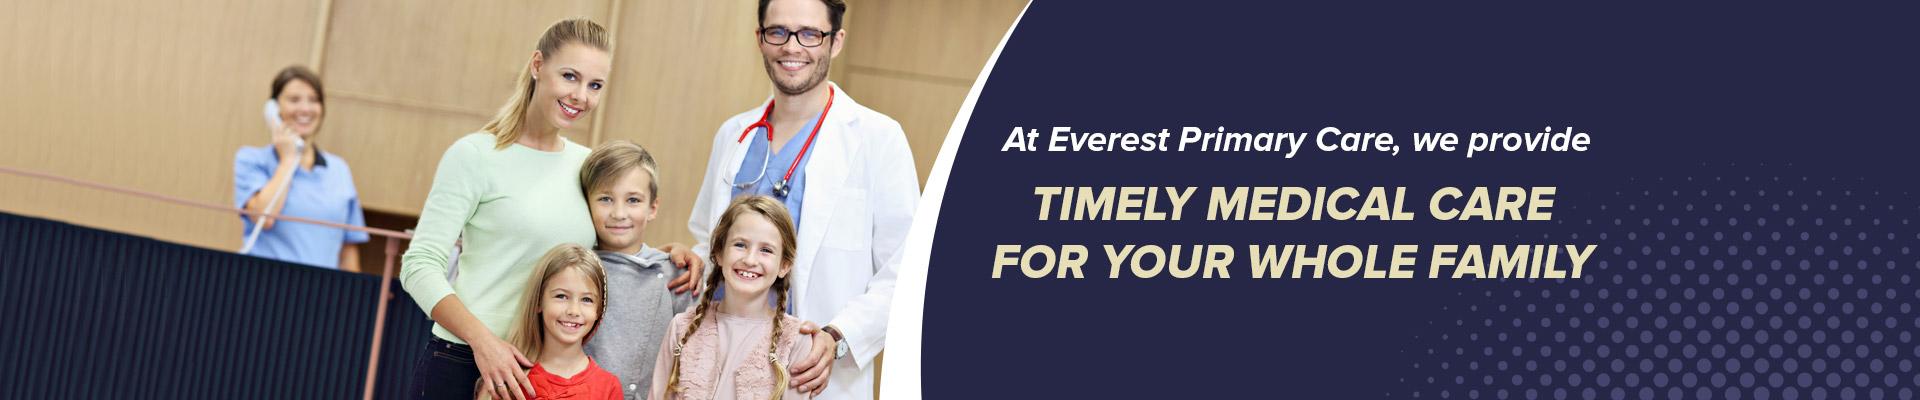 Everest Primary Care